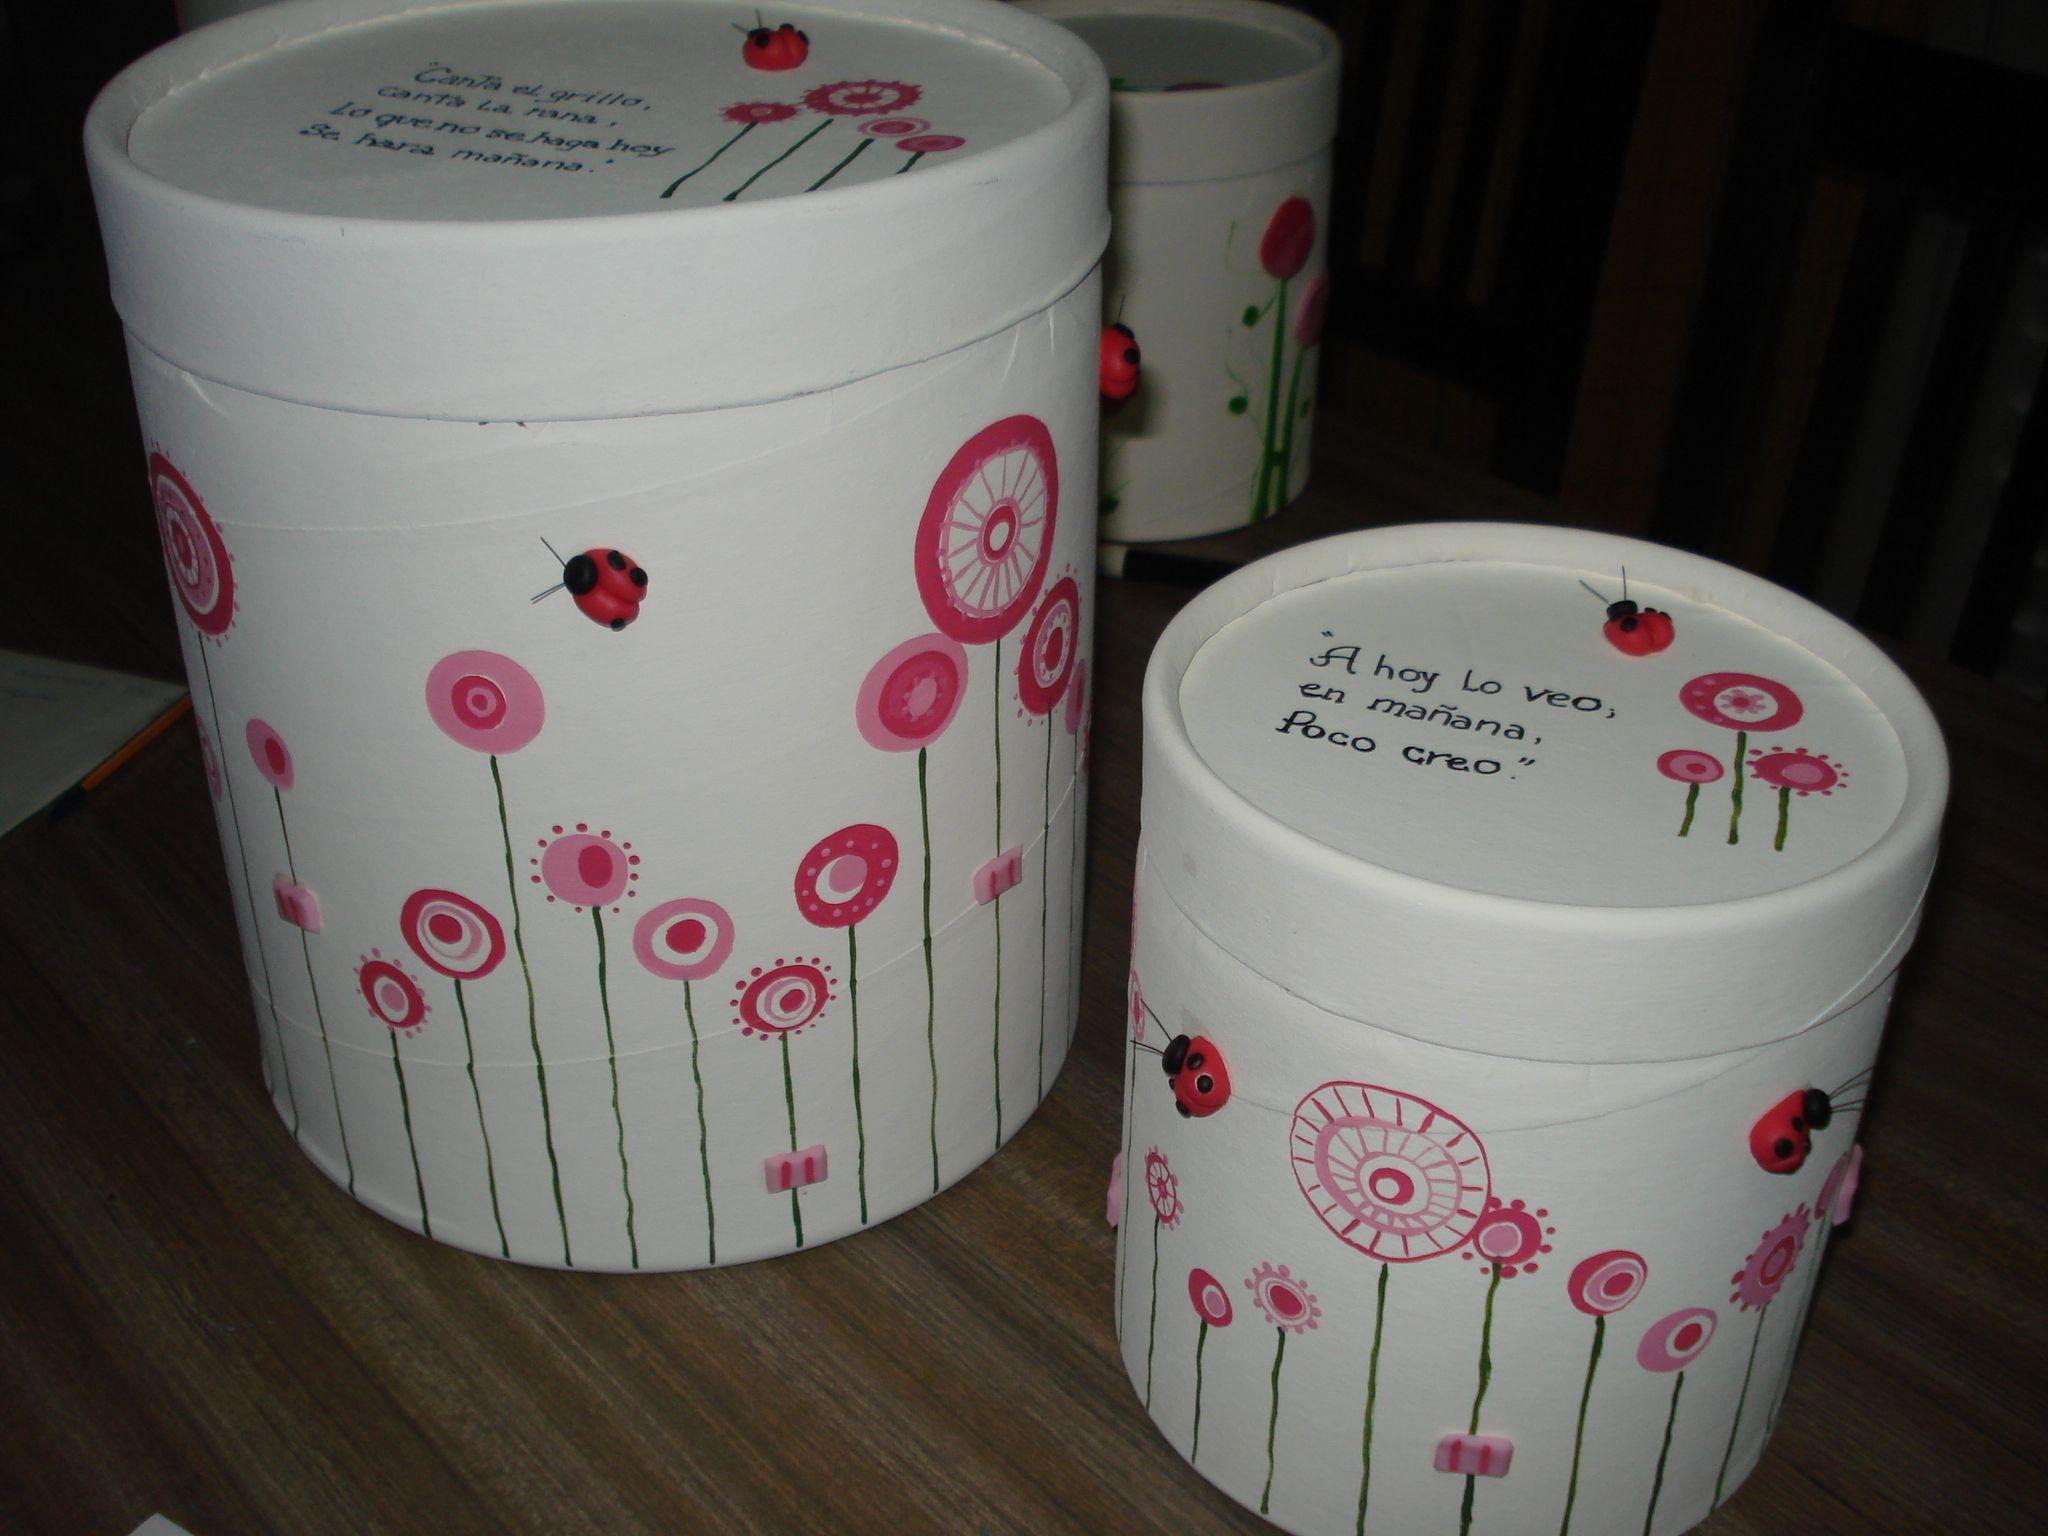 Cajas de carton pintadas cajas souvenirs pinterest for Cajas grandes de carton decoradas